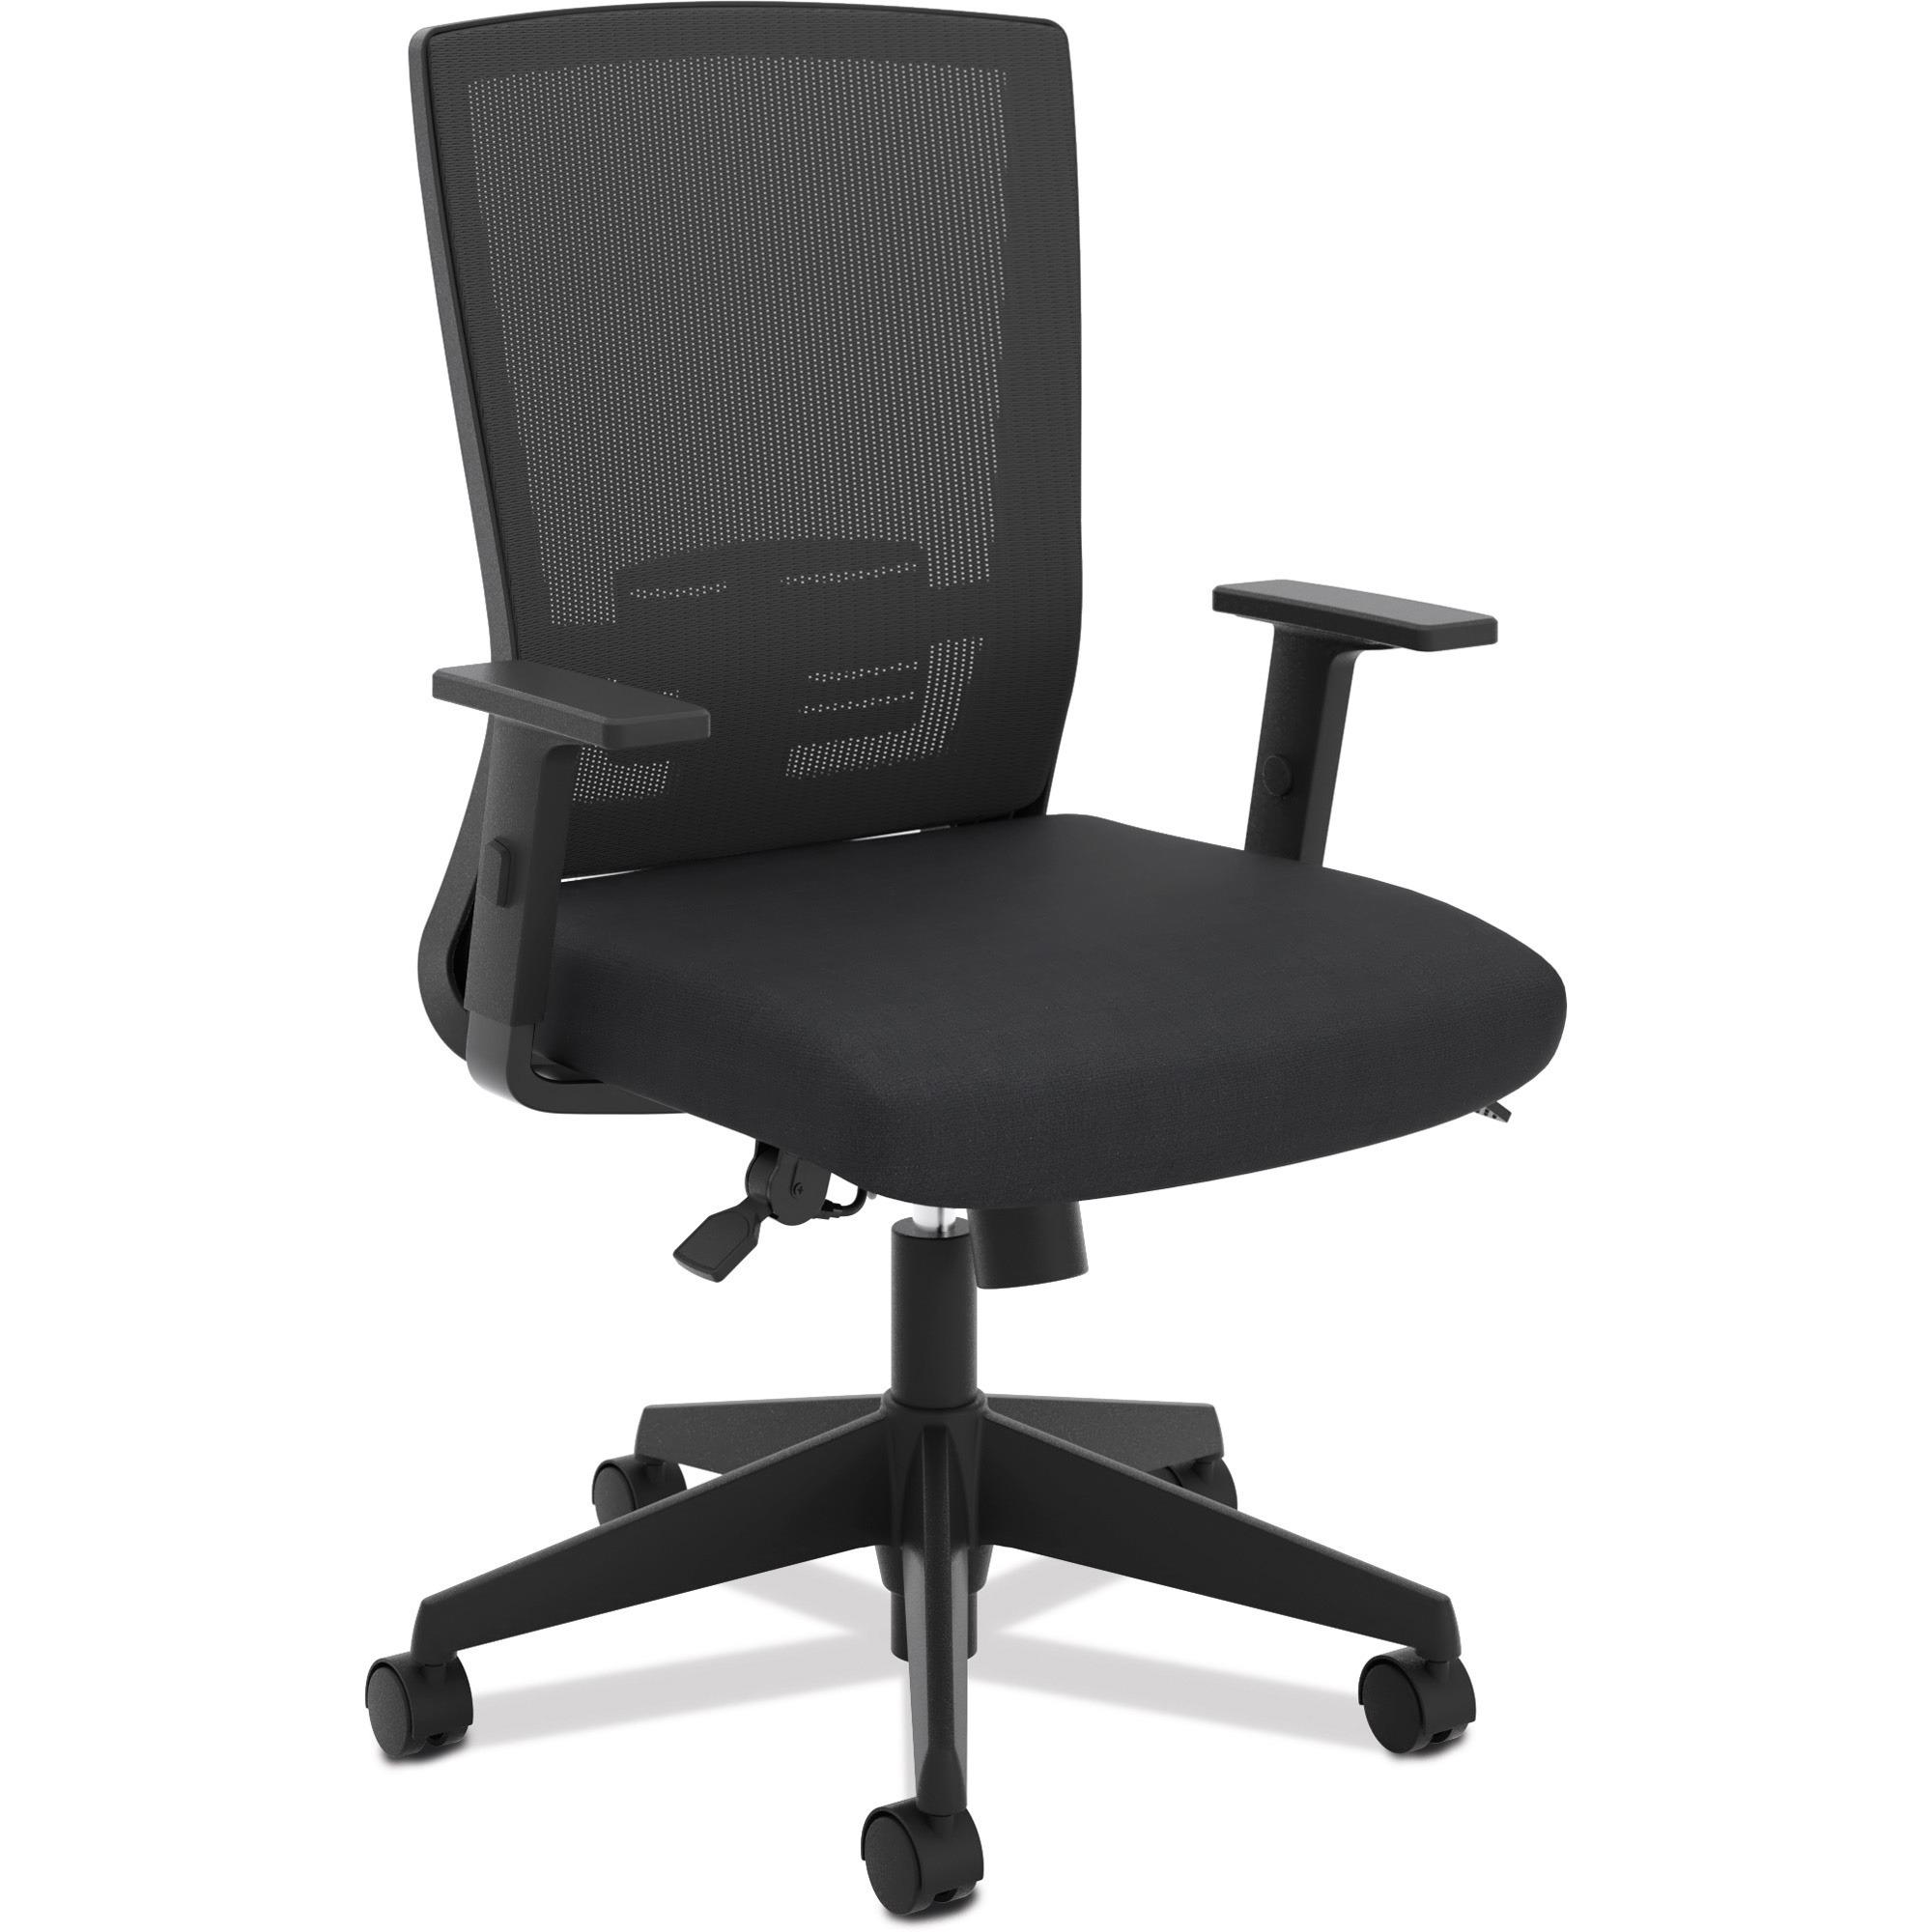 West Coast fice Supplies Furniture Chairs Chair Mats